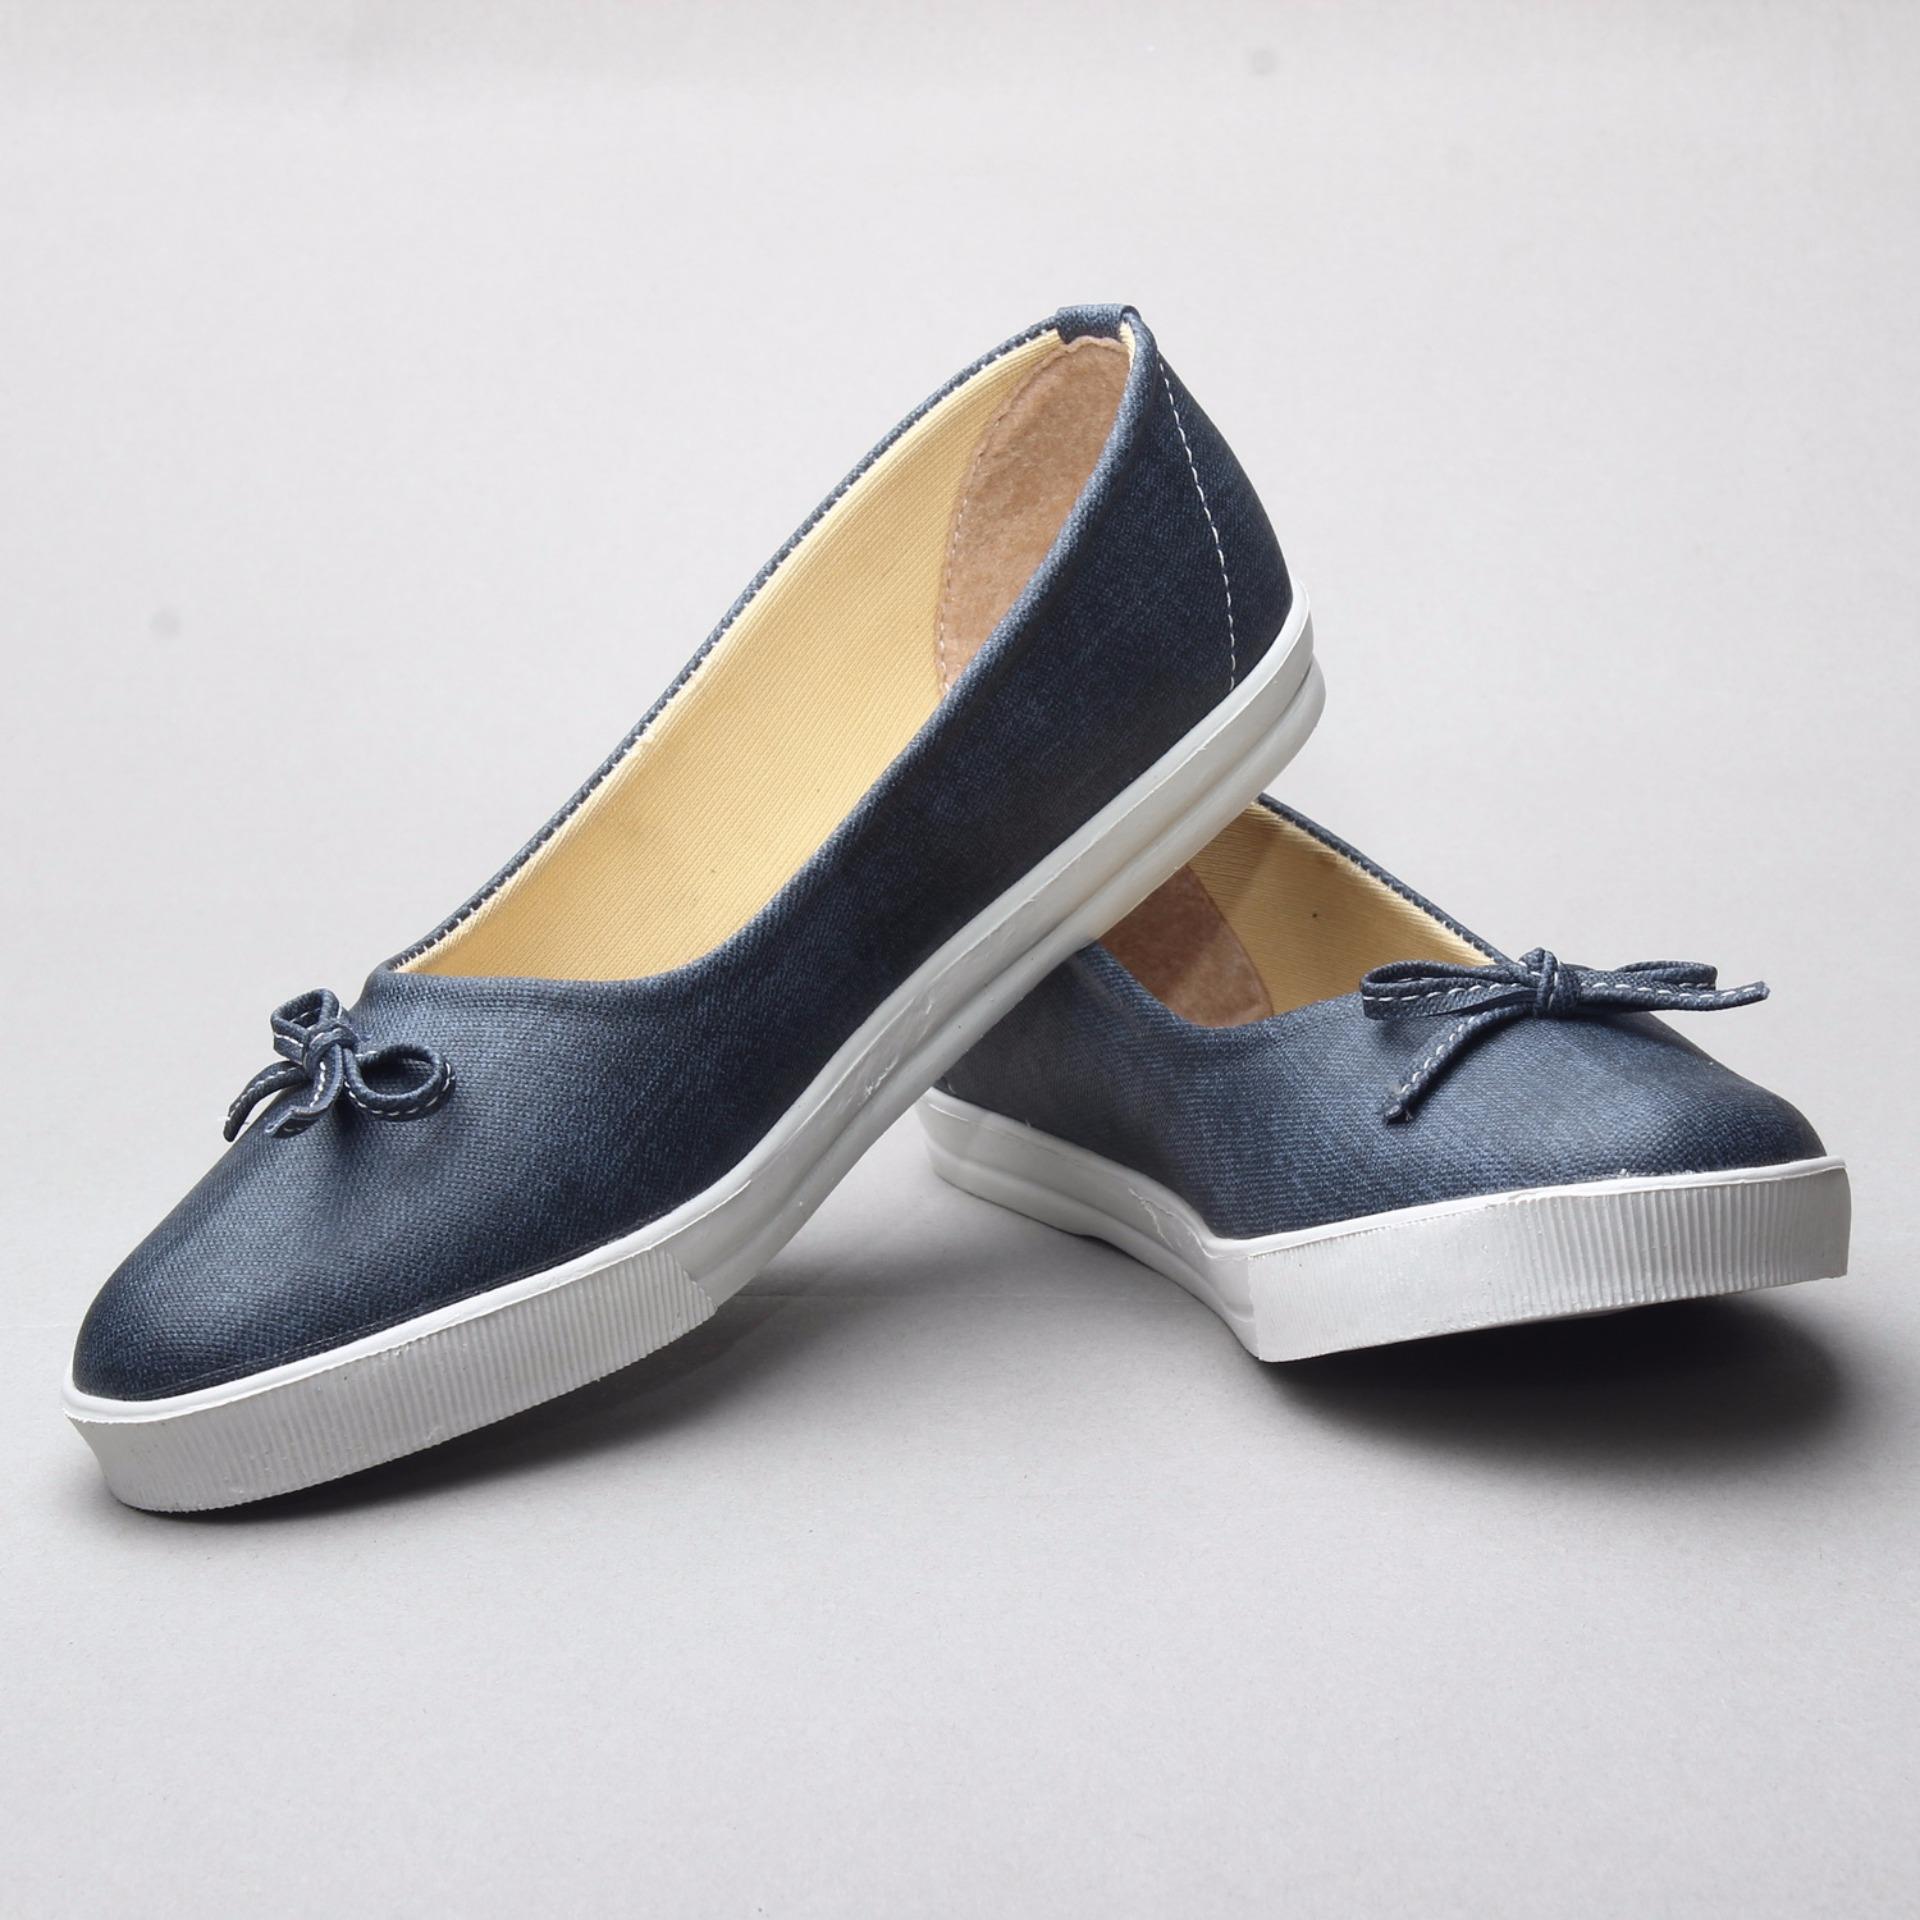 Spesifikasi Salvora Sepatu Flat Ujs Hitam Murah